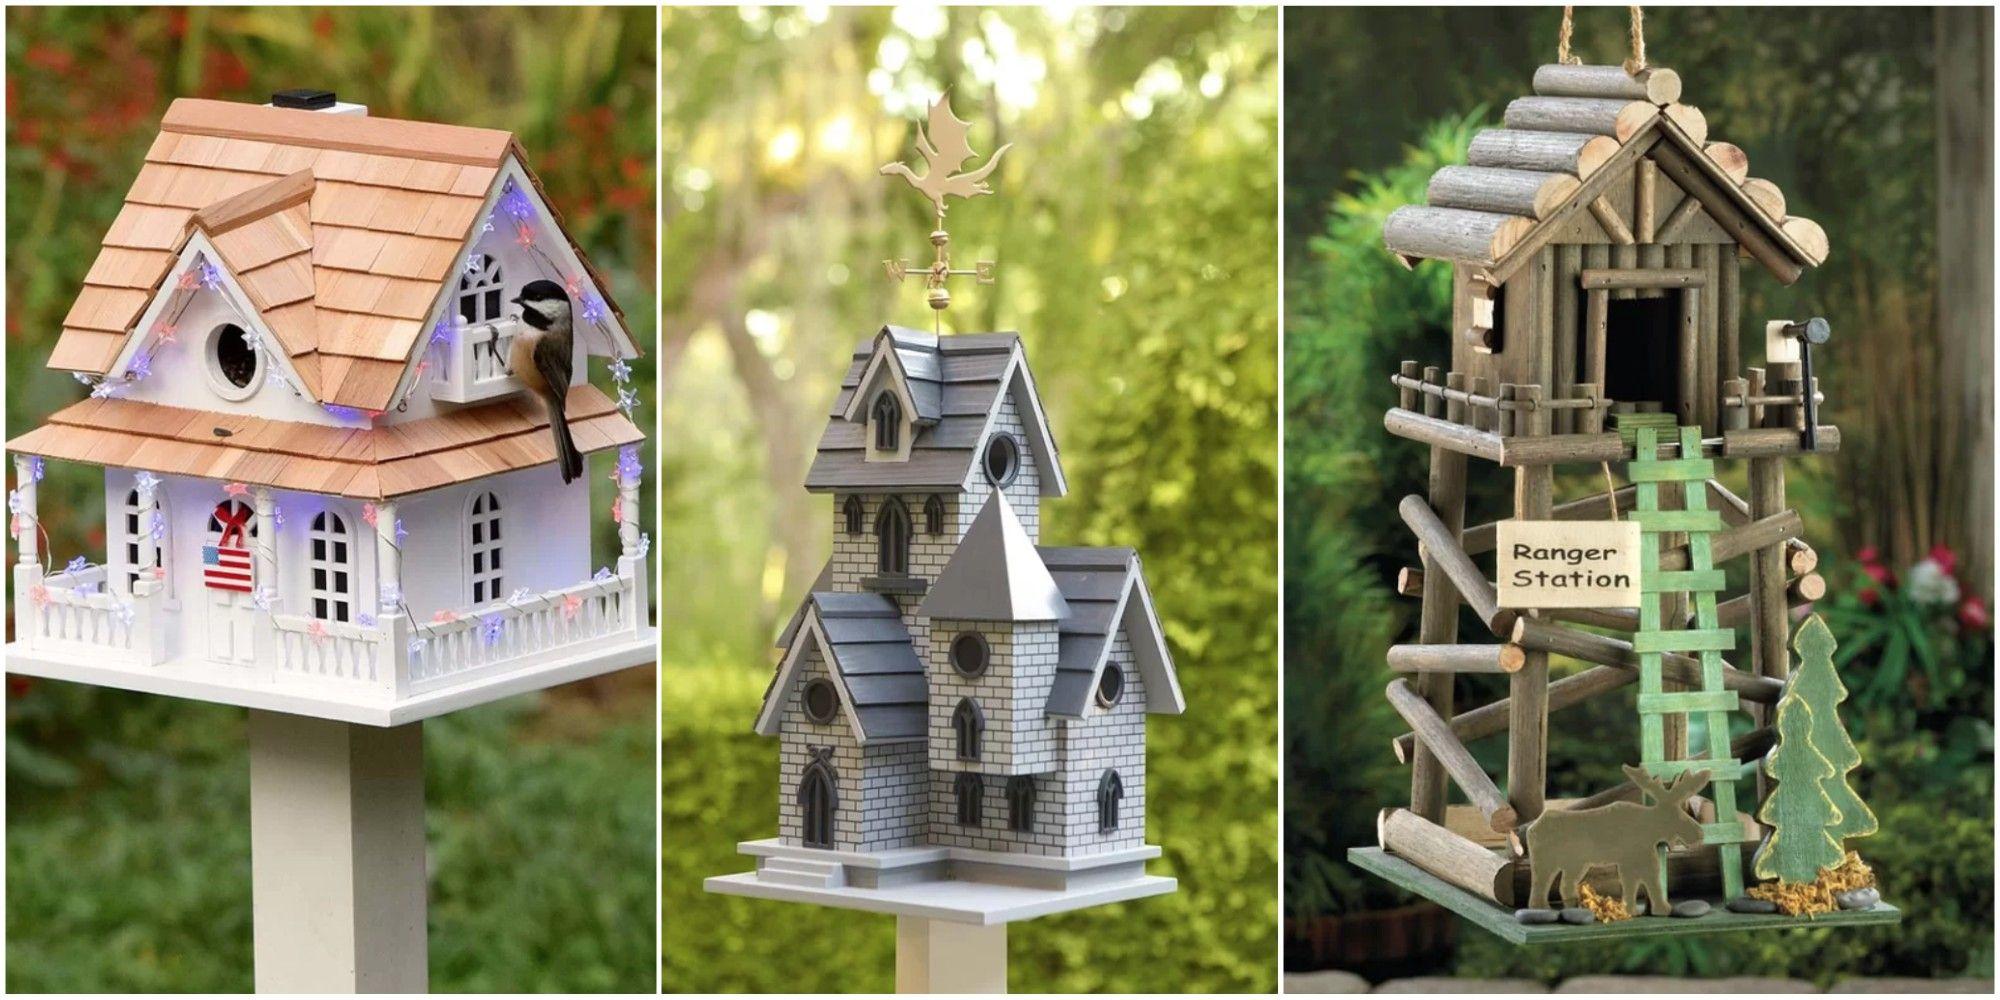 Awesome Decorative Birdhouses